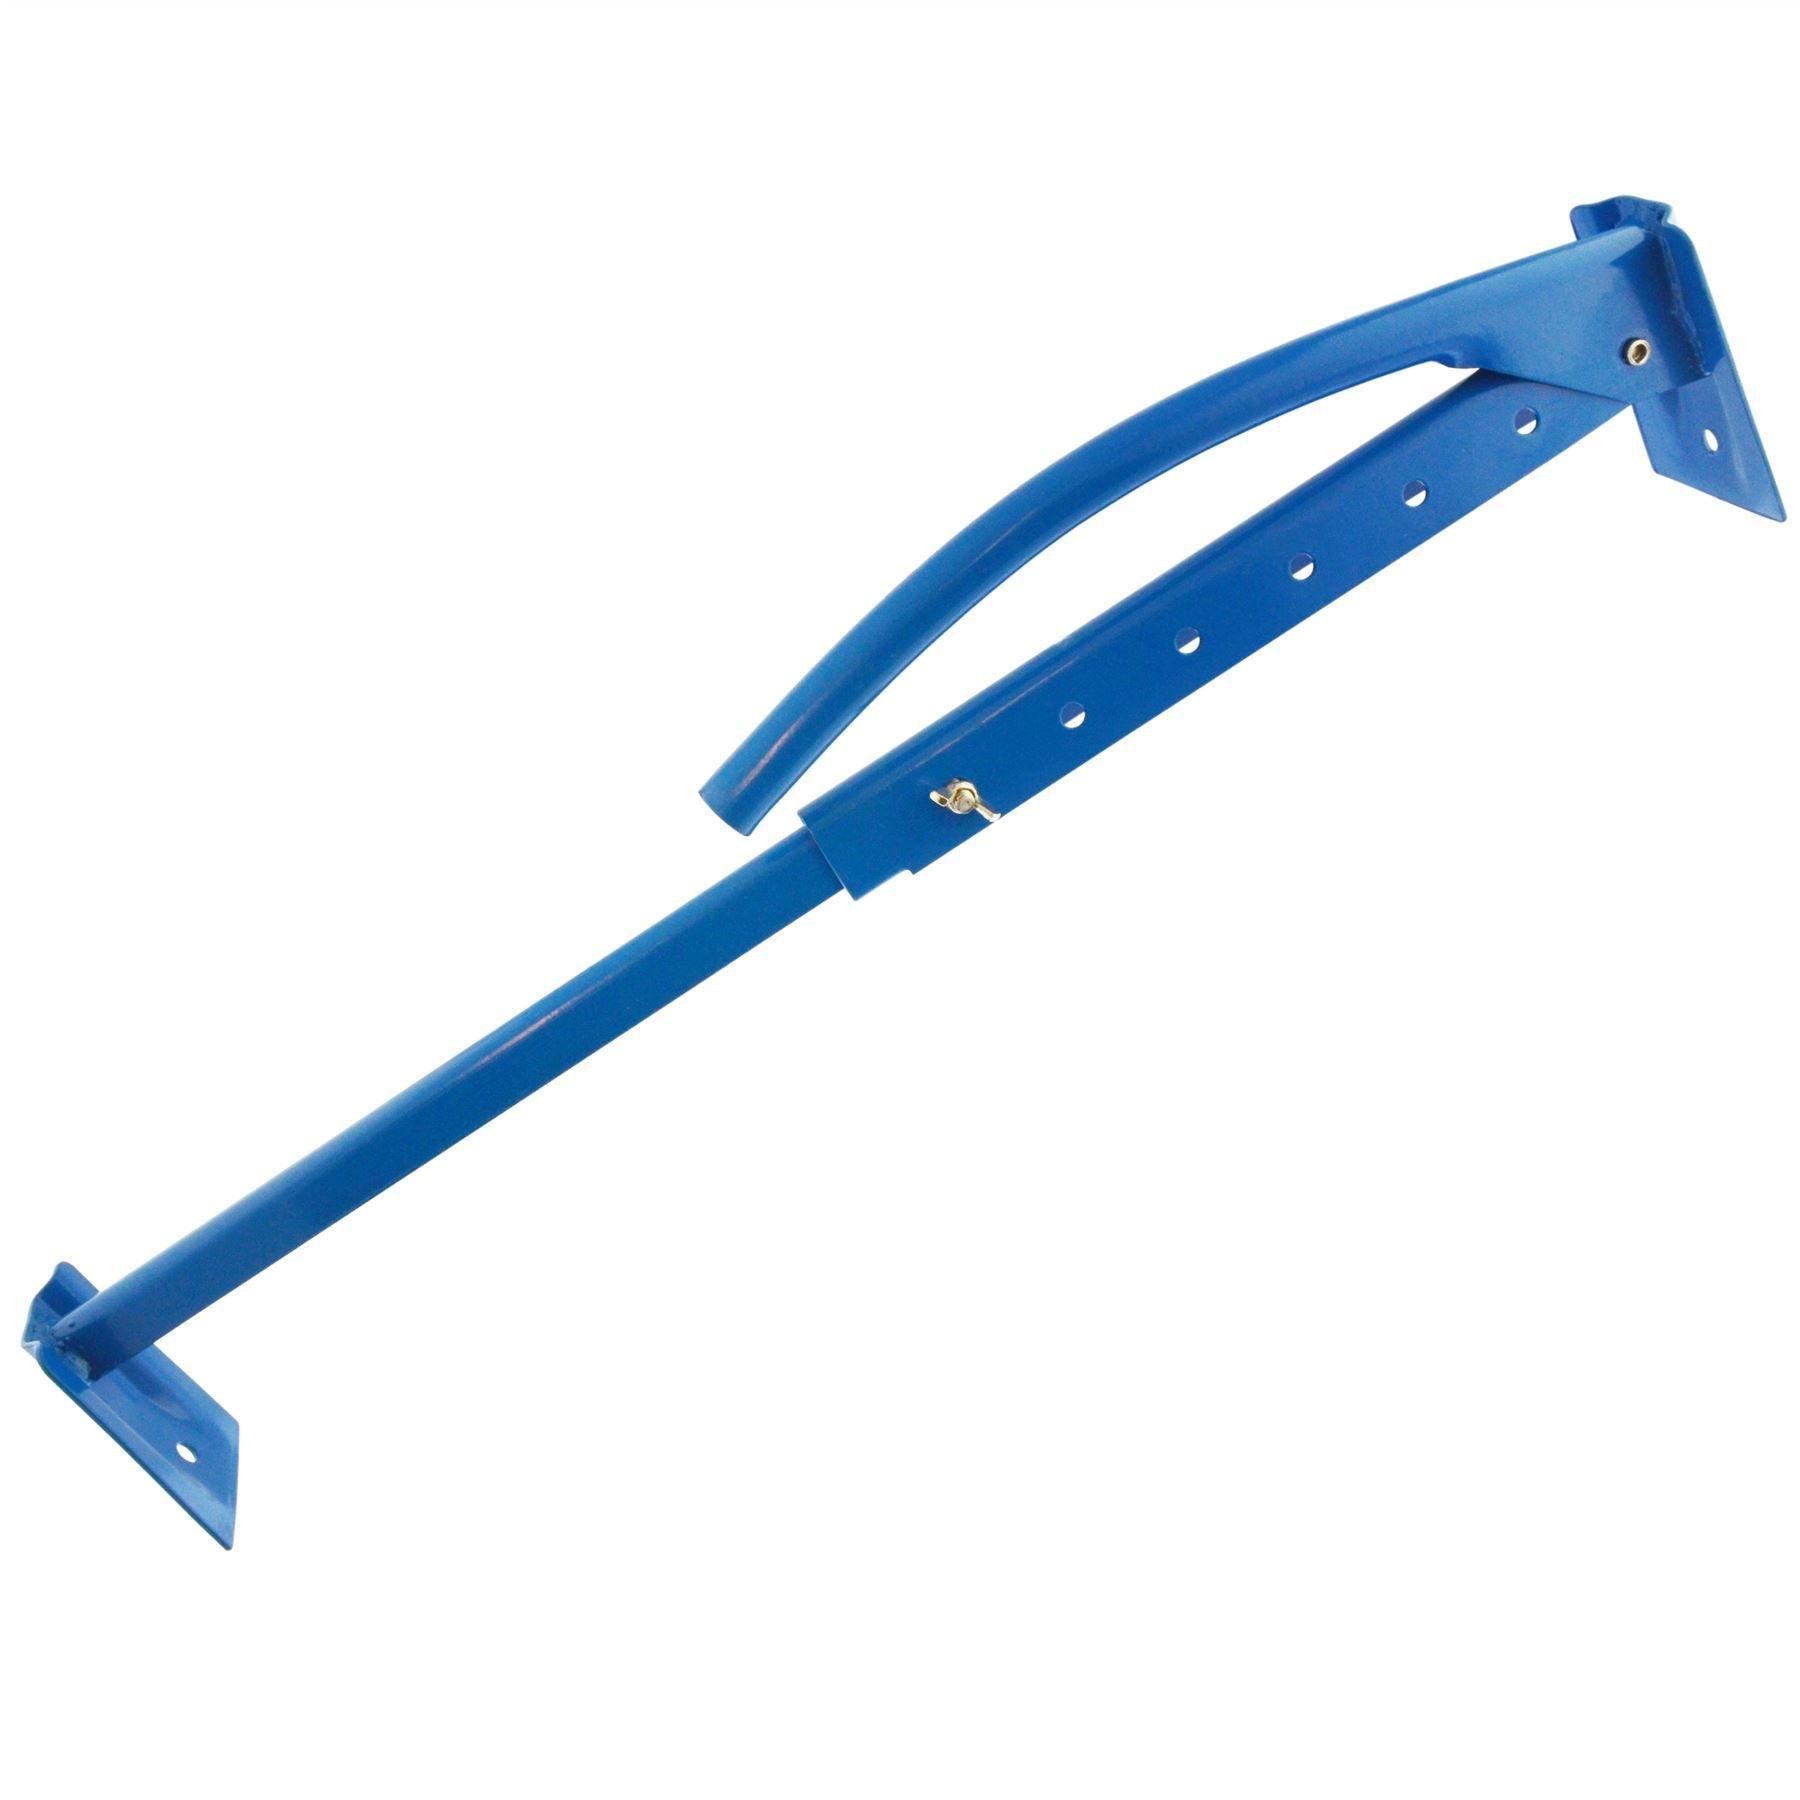 Brick Lifter Tong Lifting Adjustable Carrying Clamp 400-670mm 6-10 Bricks SIL326 by A B Tools (Image #3)